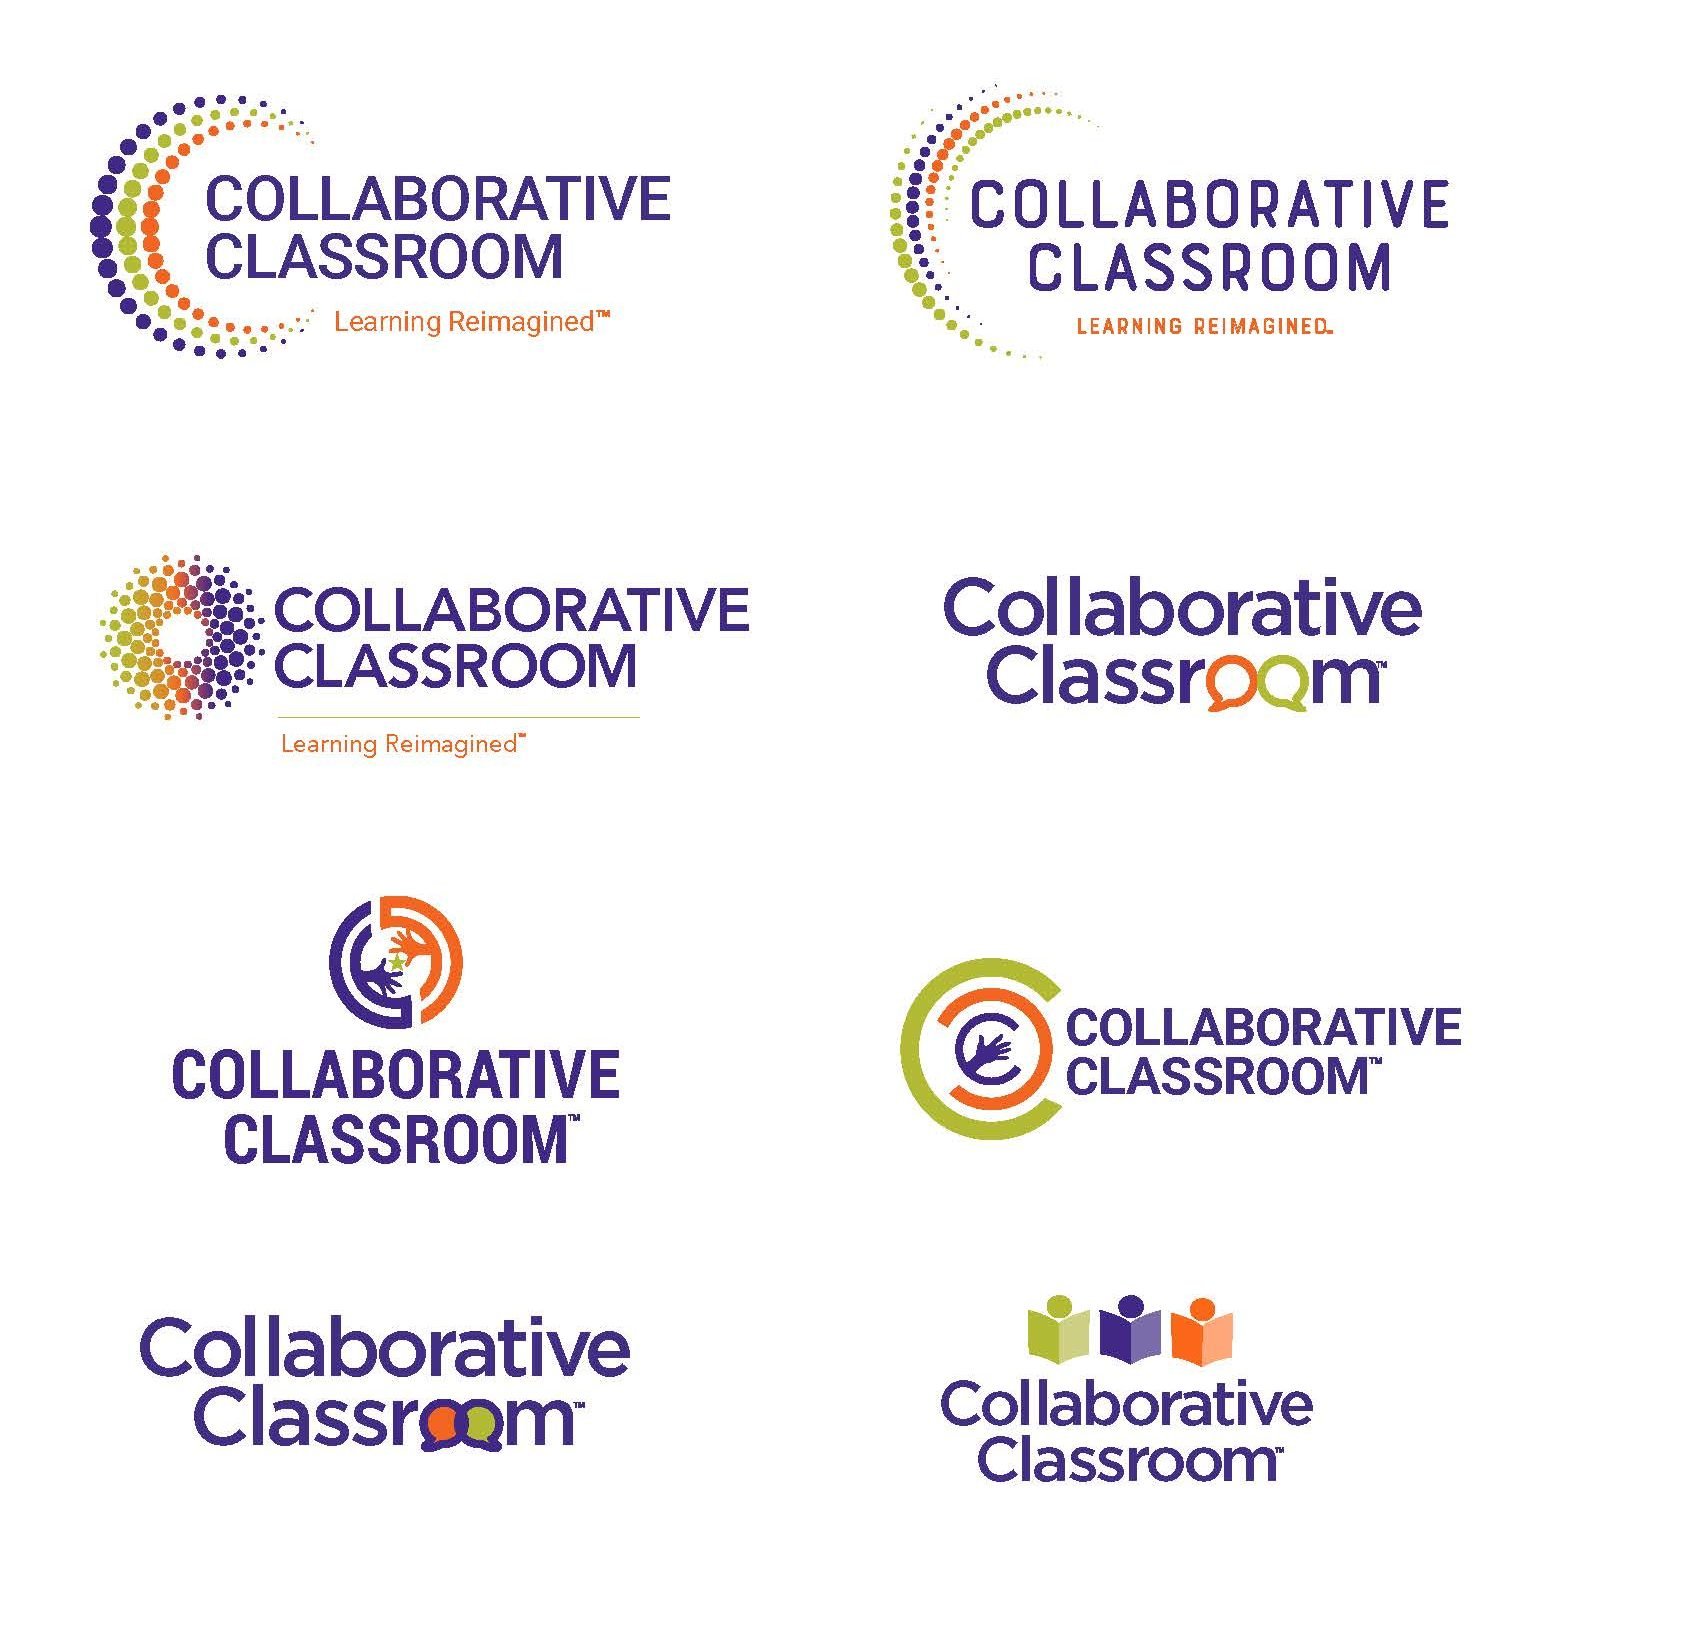 Collaborative Classroom logo mockups